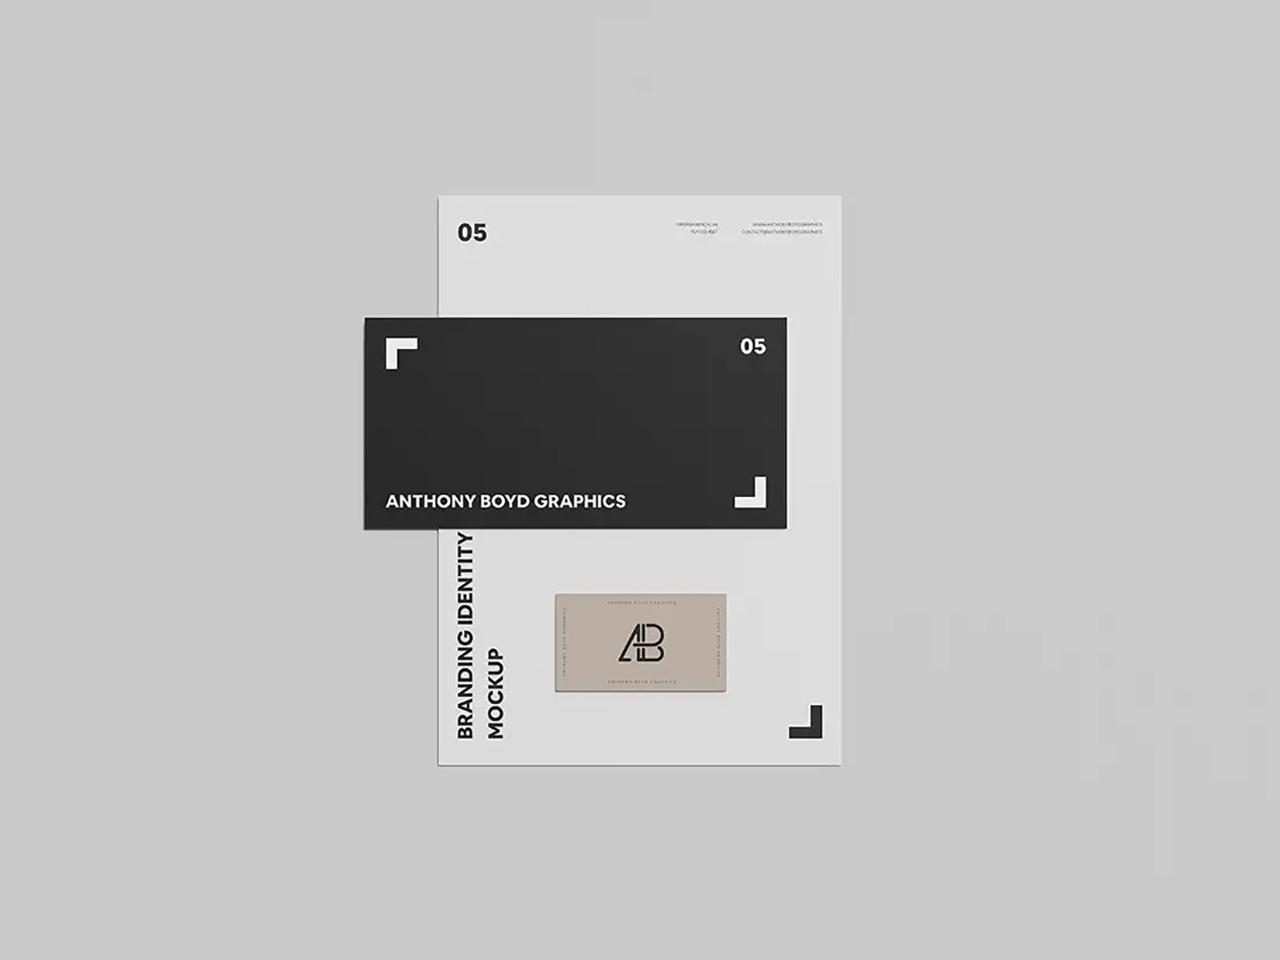 Branding Identity Mockup Vol. 6